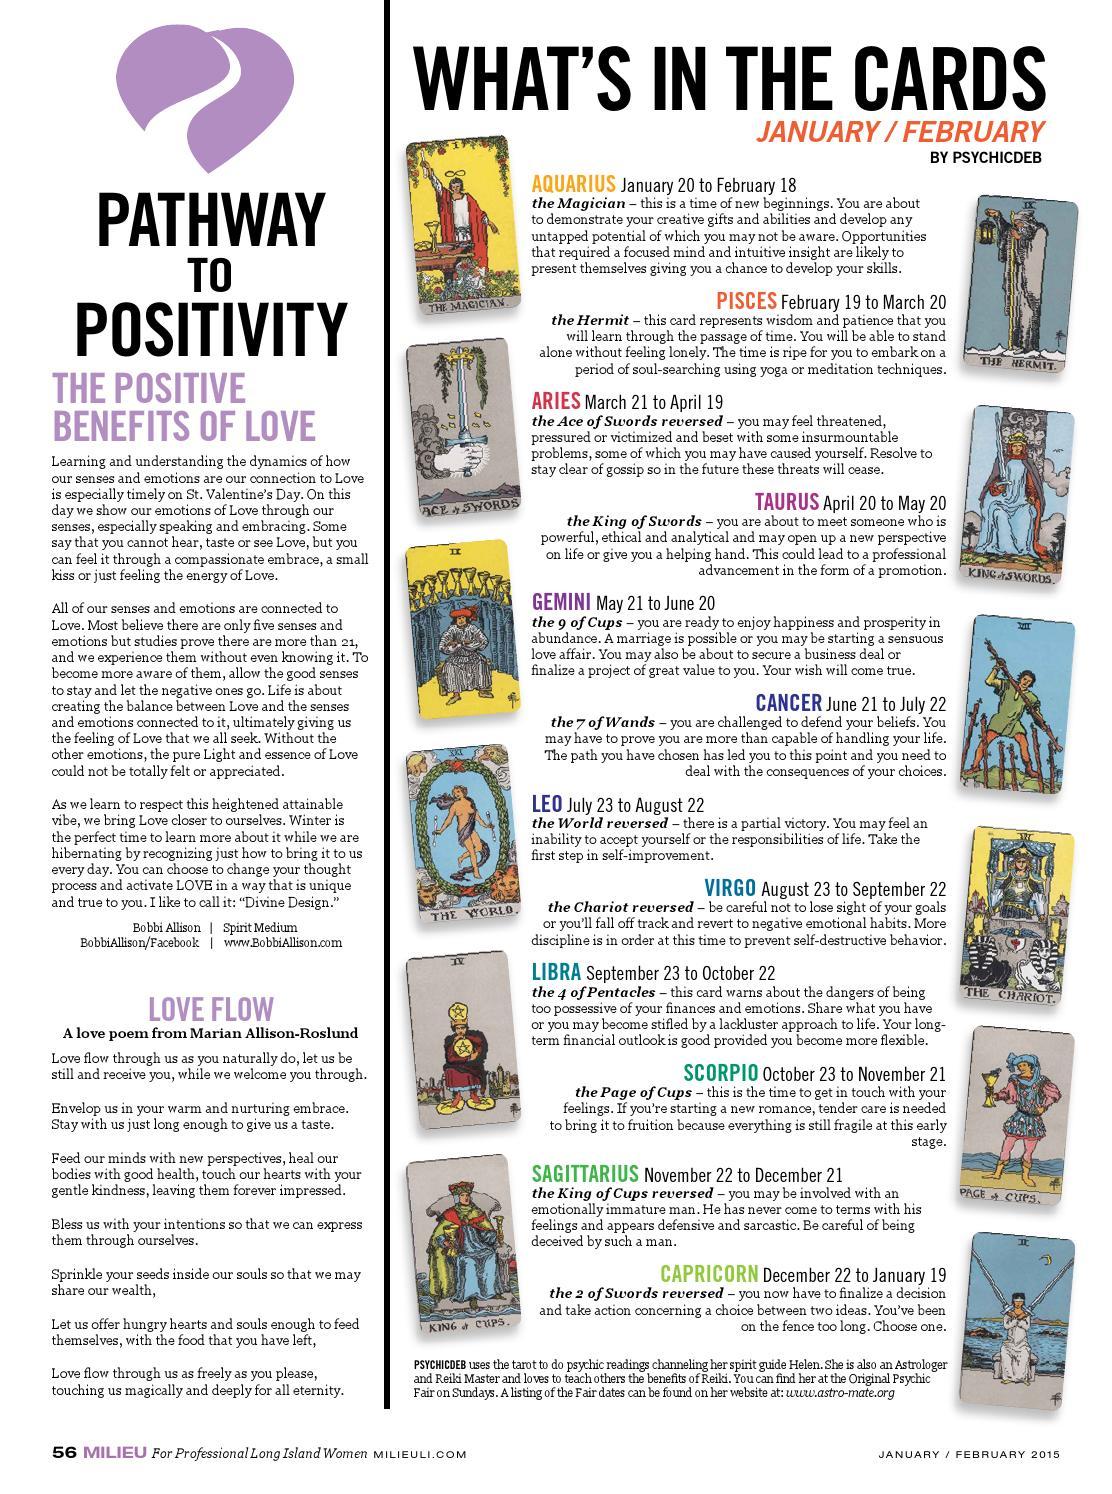 Milieu Magazine - Volume 03, Issue 01 by Milieu Magazine For